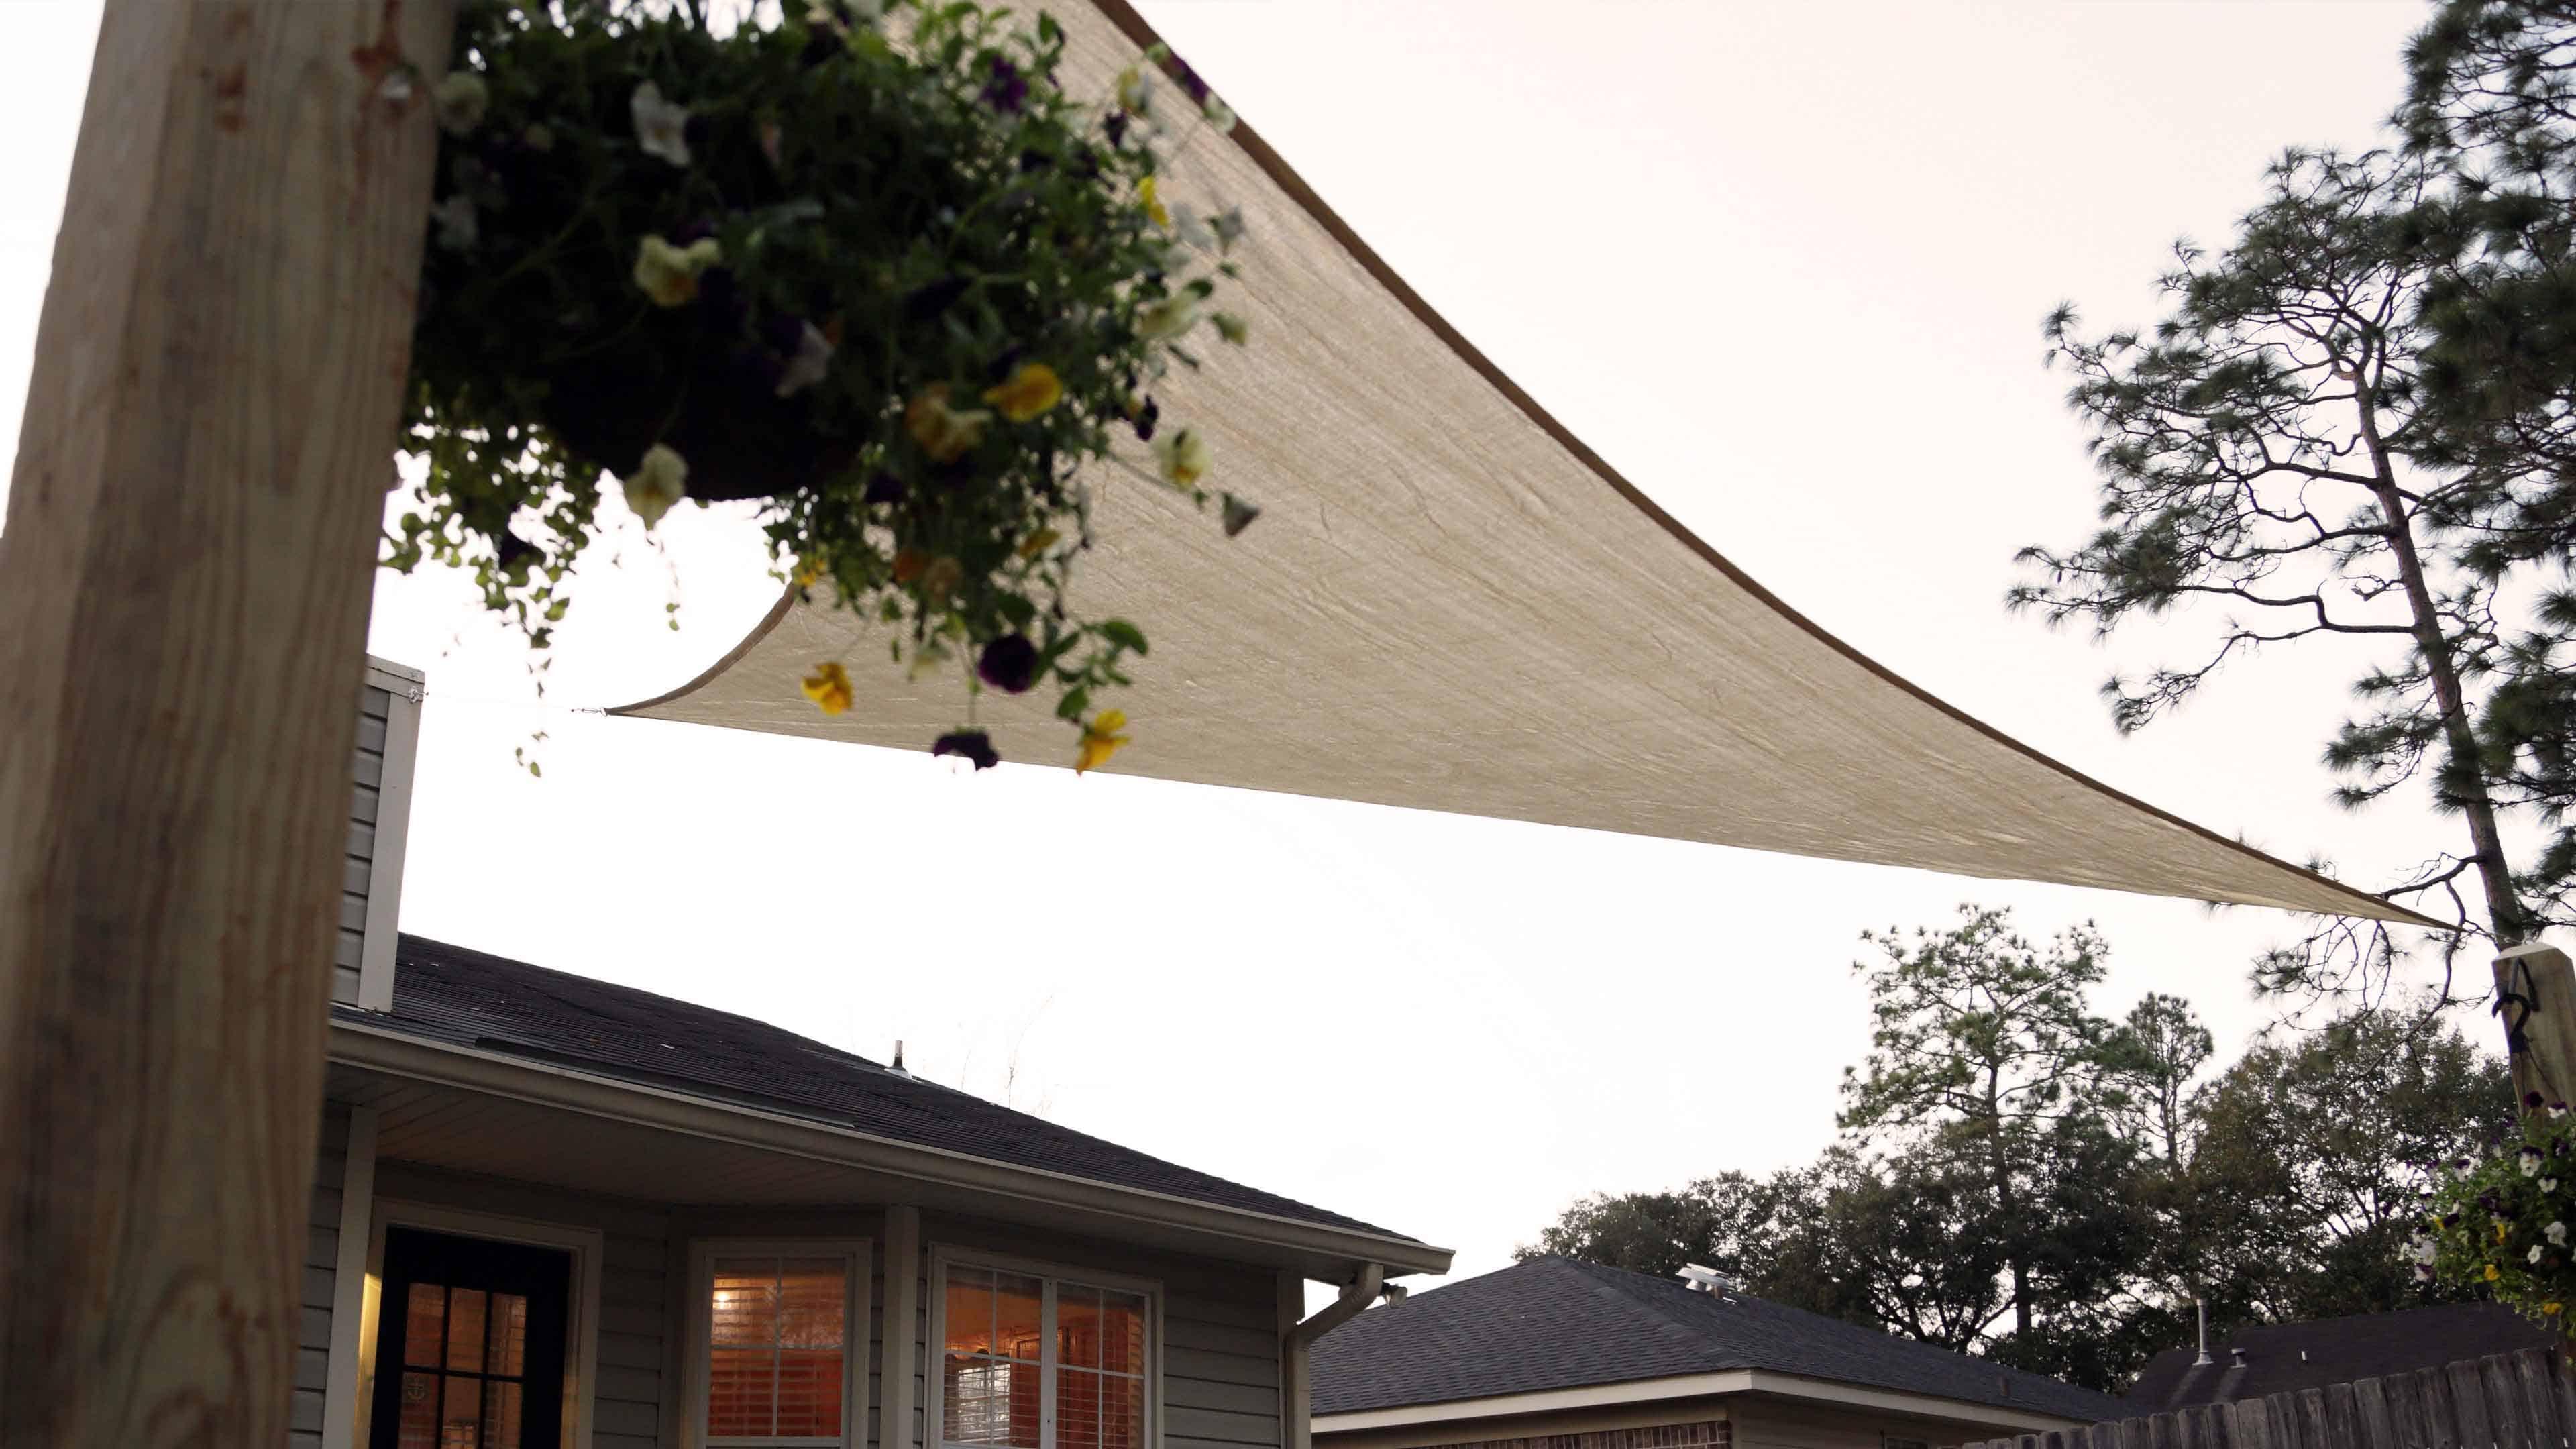 Shade sails provide inexpensive shade and UV protection